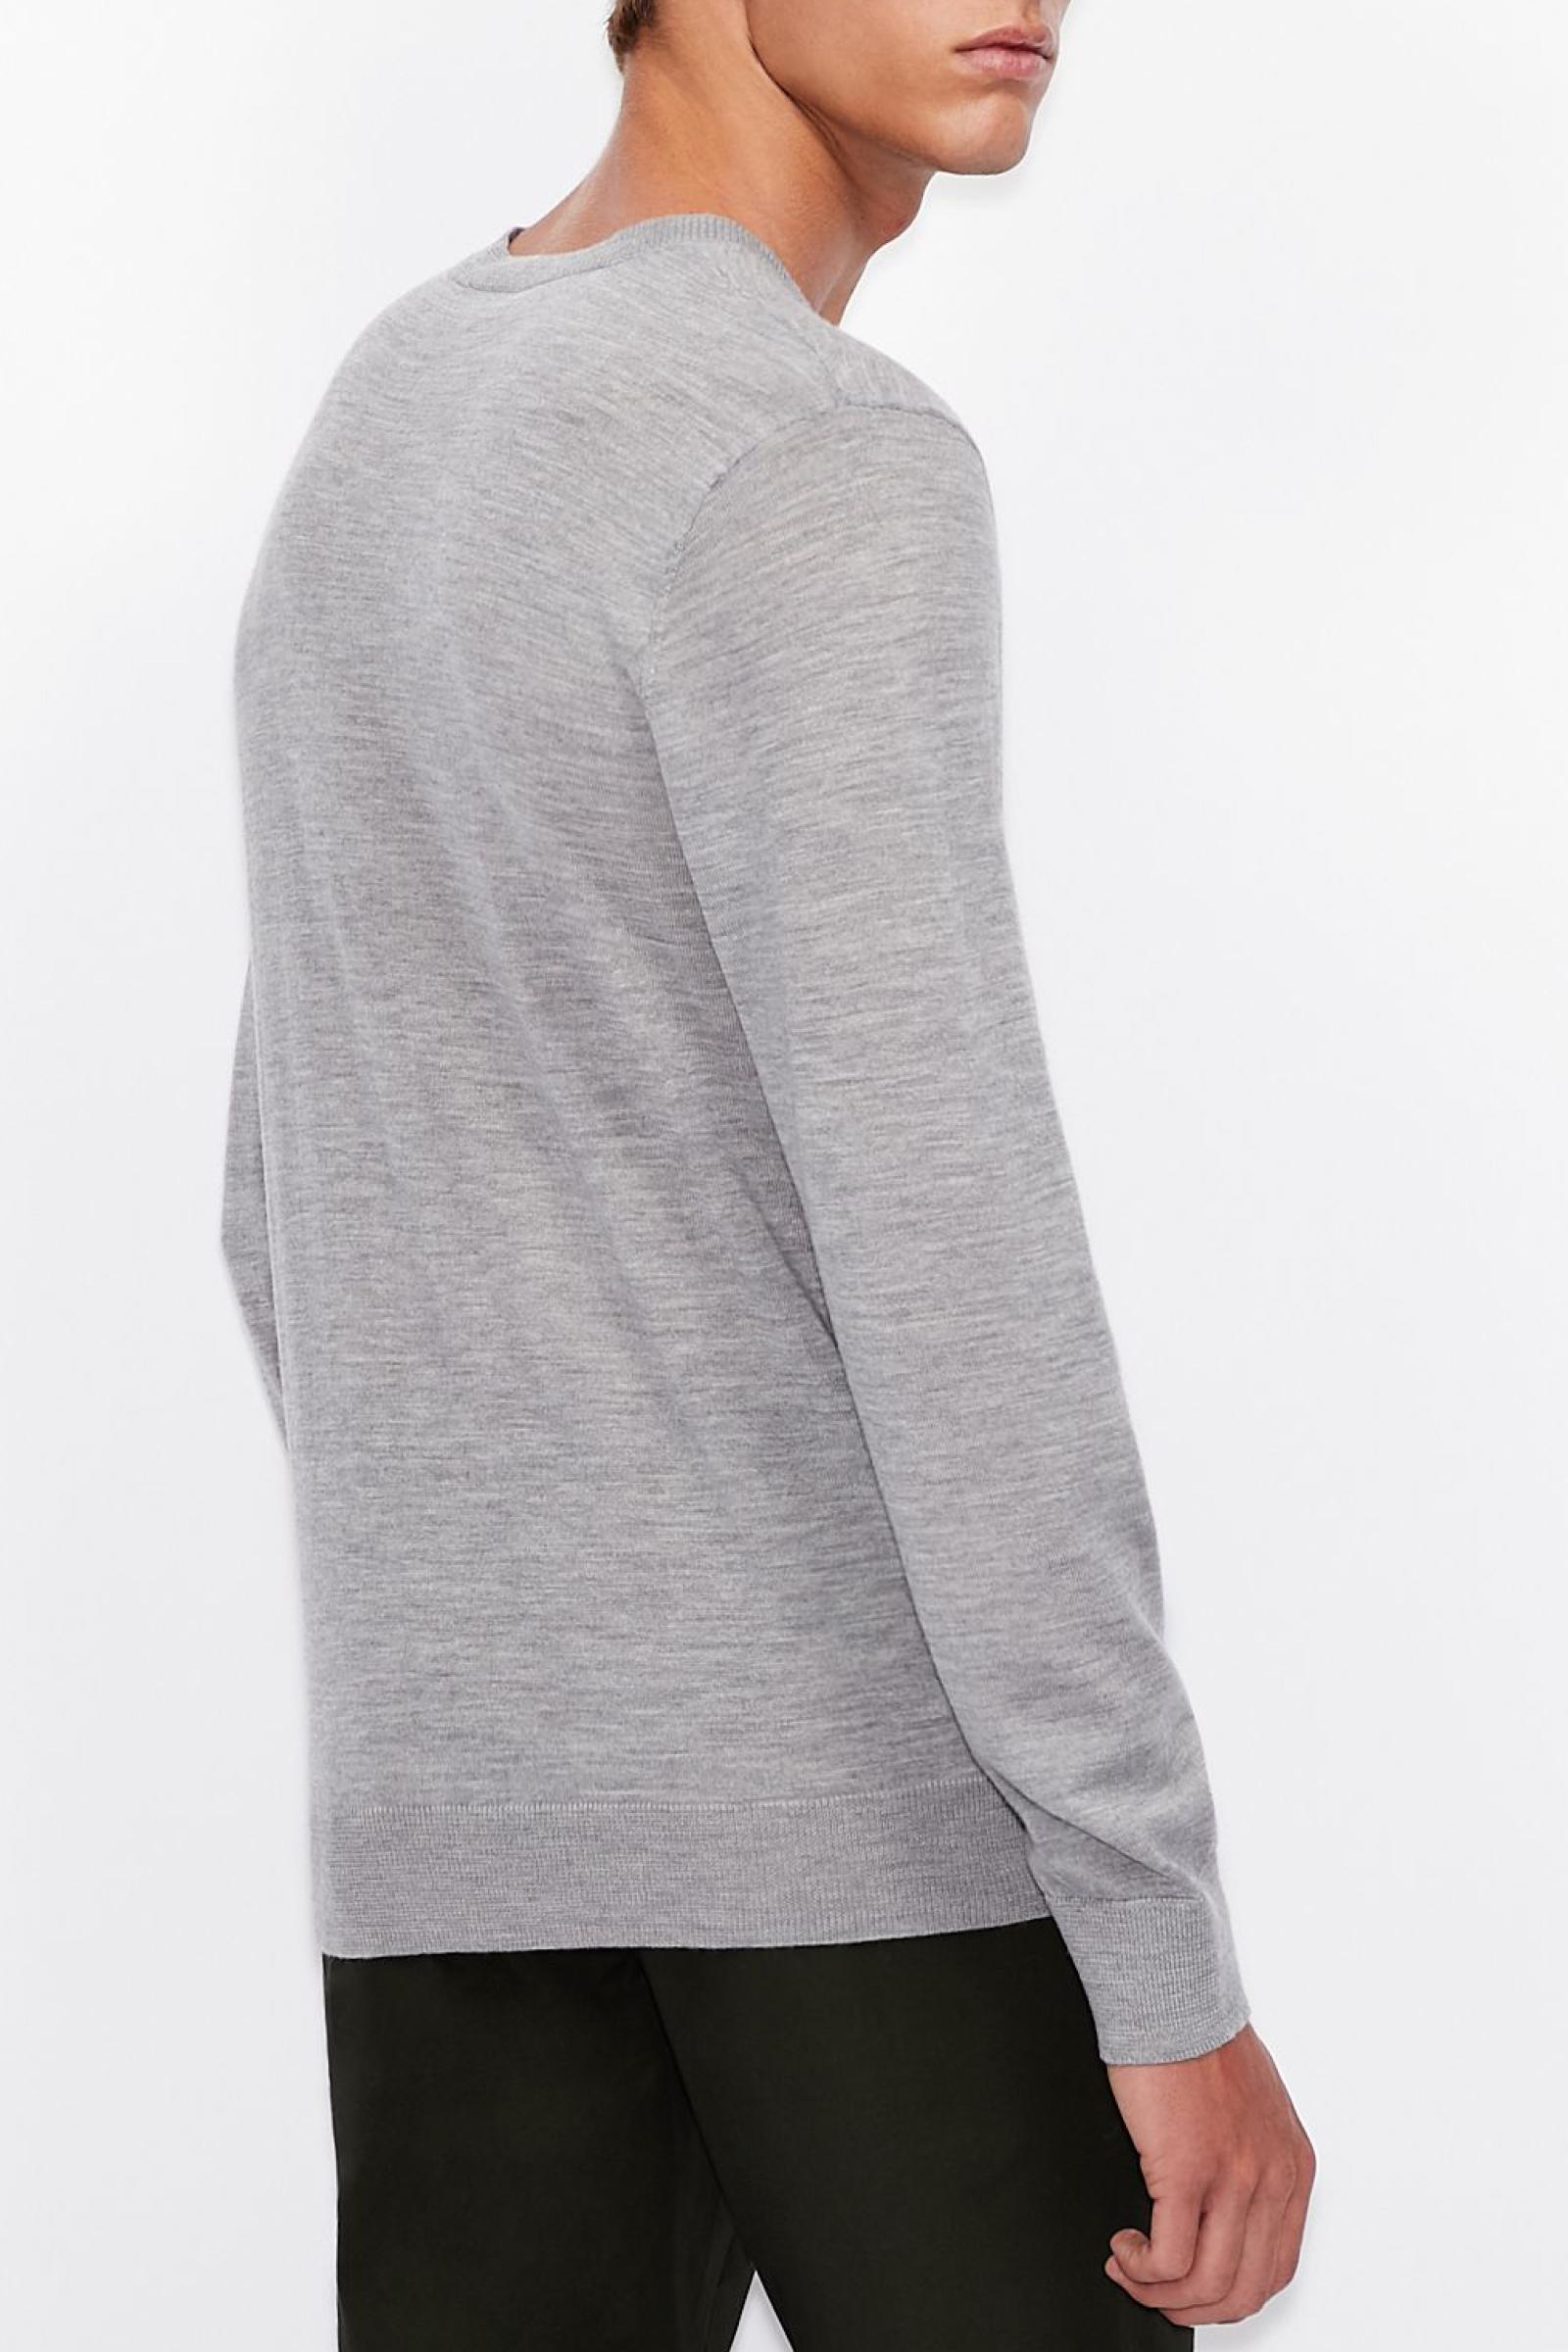 ARMANI EXCHANGE Men's Sweater ARMANI EXCHANGE   Mesh   8NZM3G ZM8AZ3901